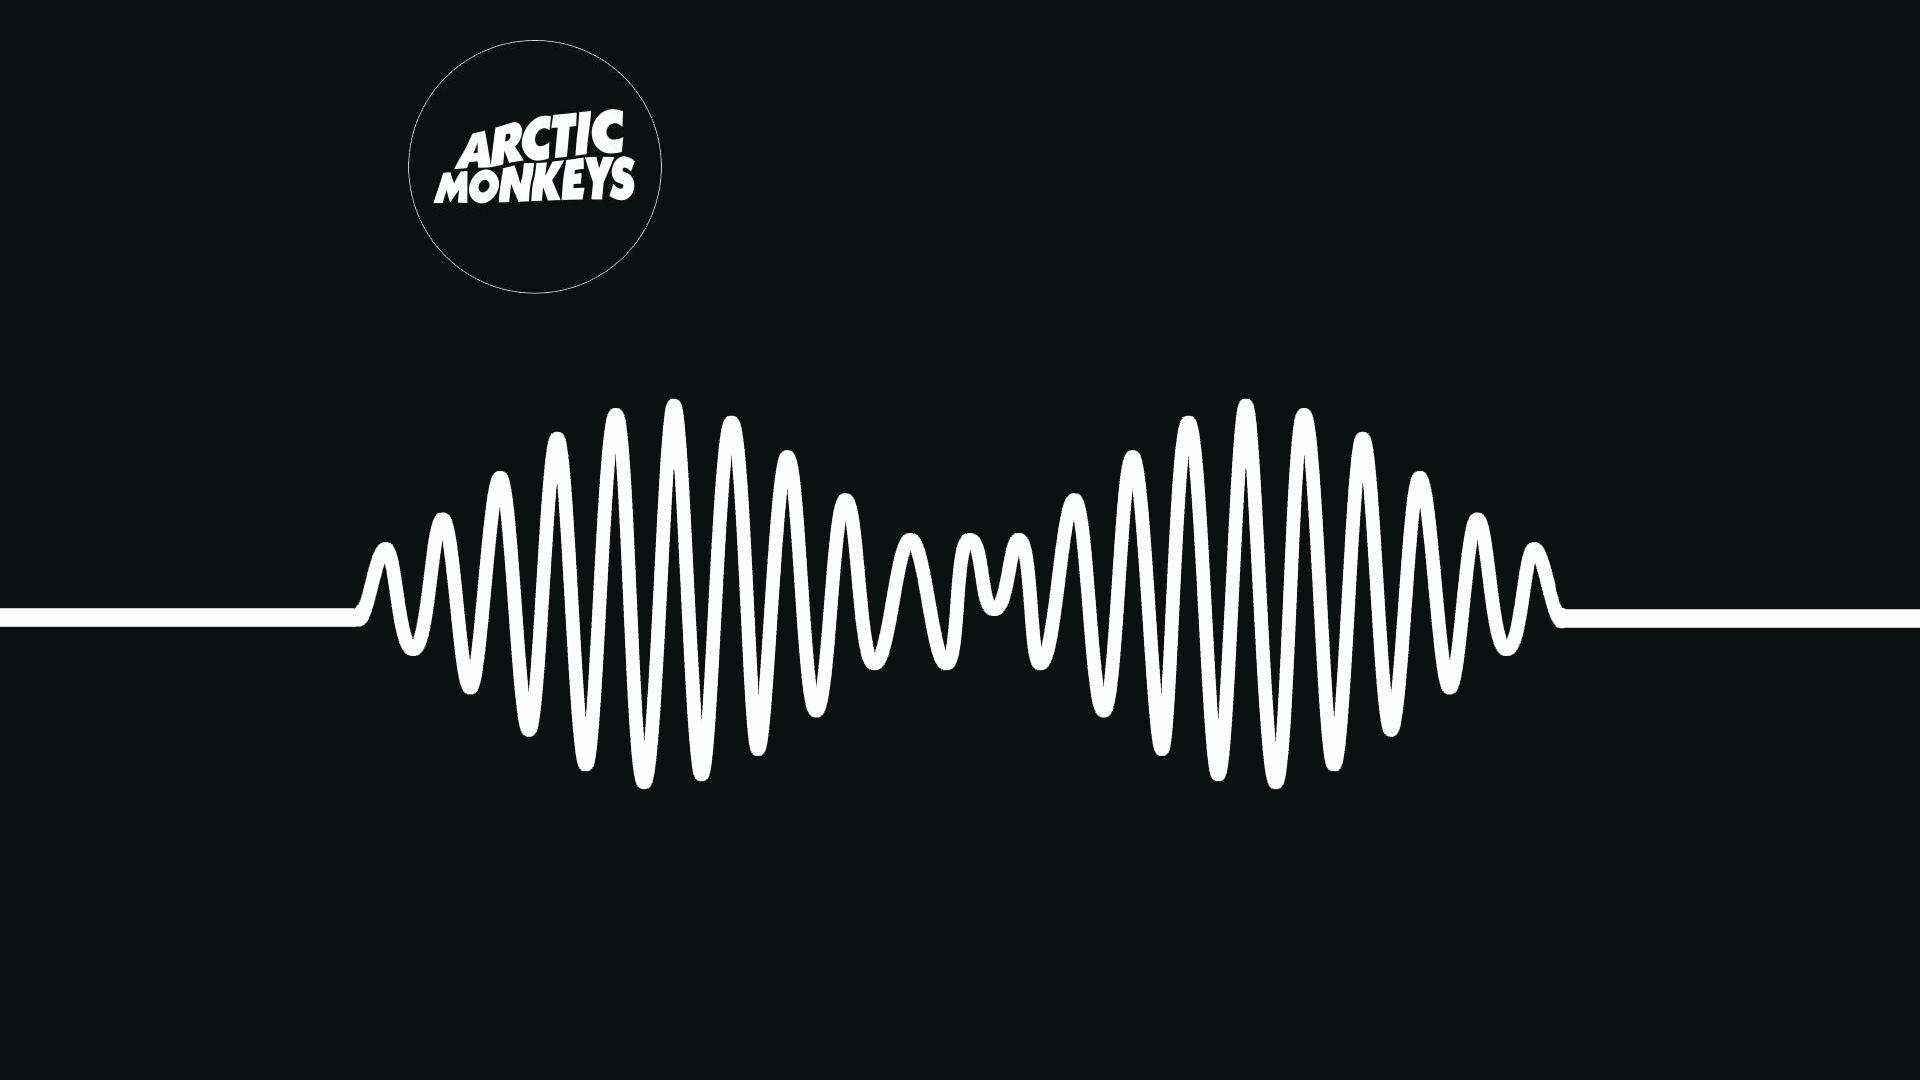 609249 Jpg 1920 1080 Arctic Monkeys Wallpaper Arctic Monkeys Monkey Wallpaper